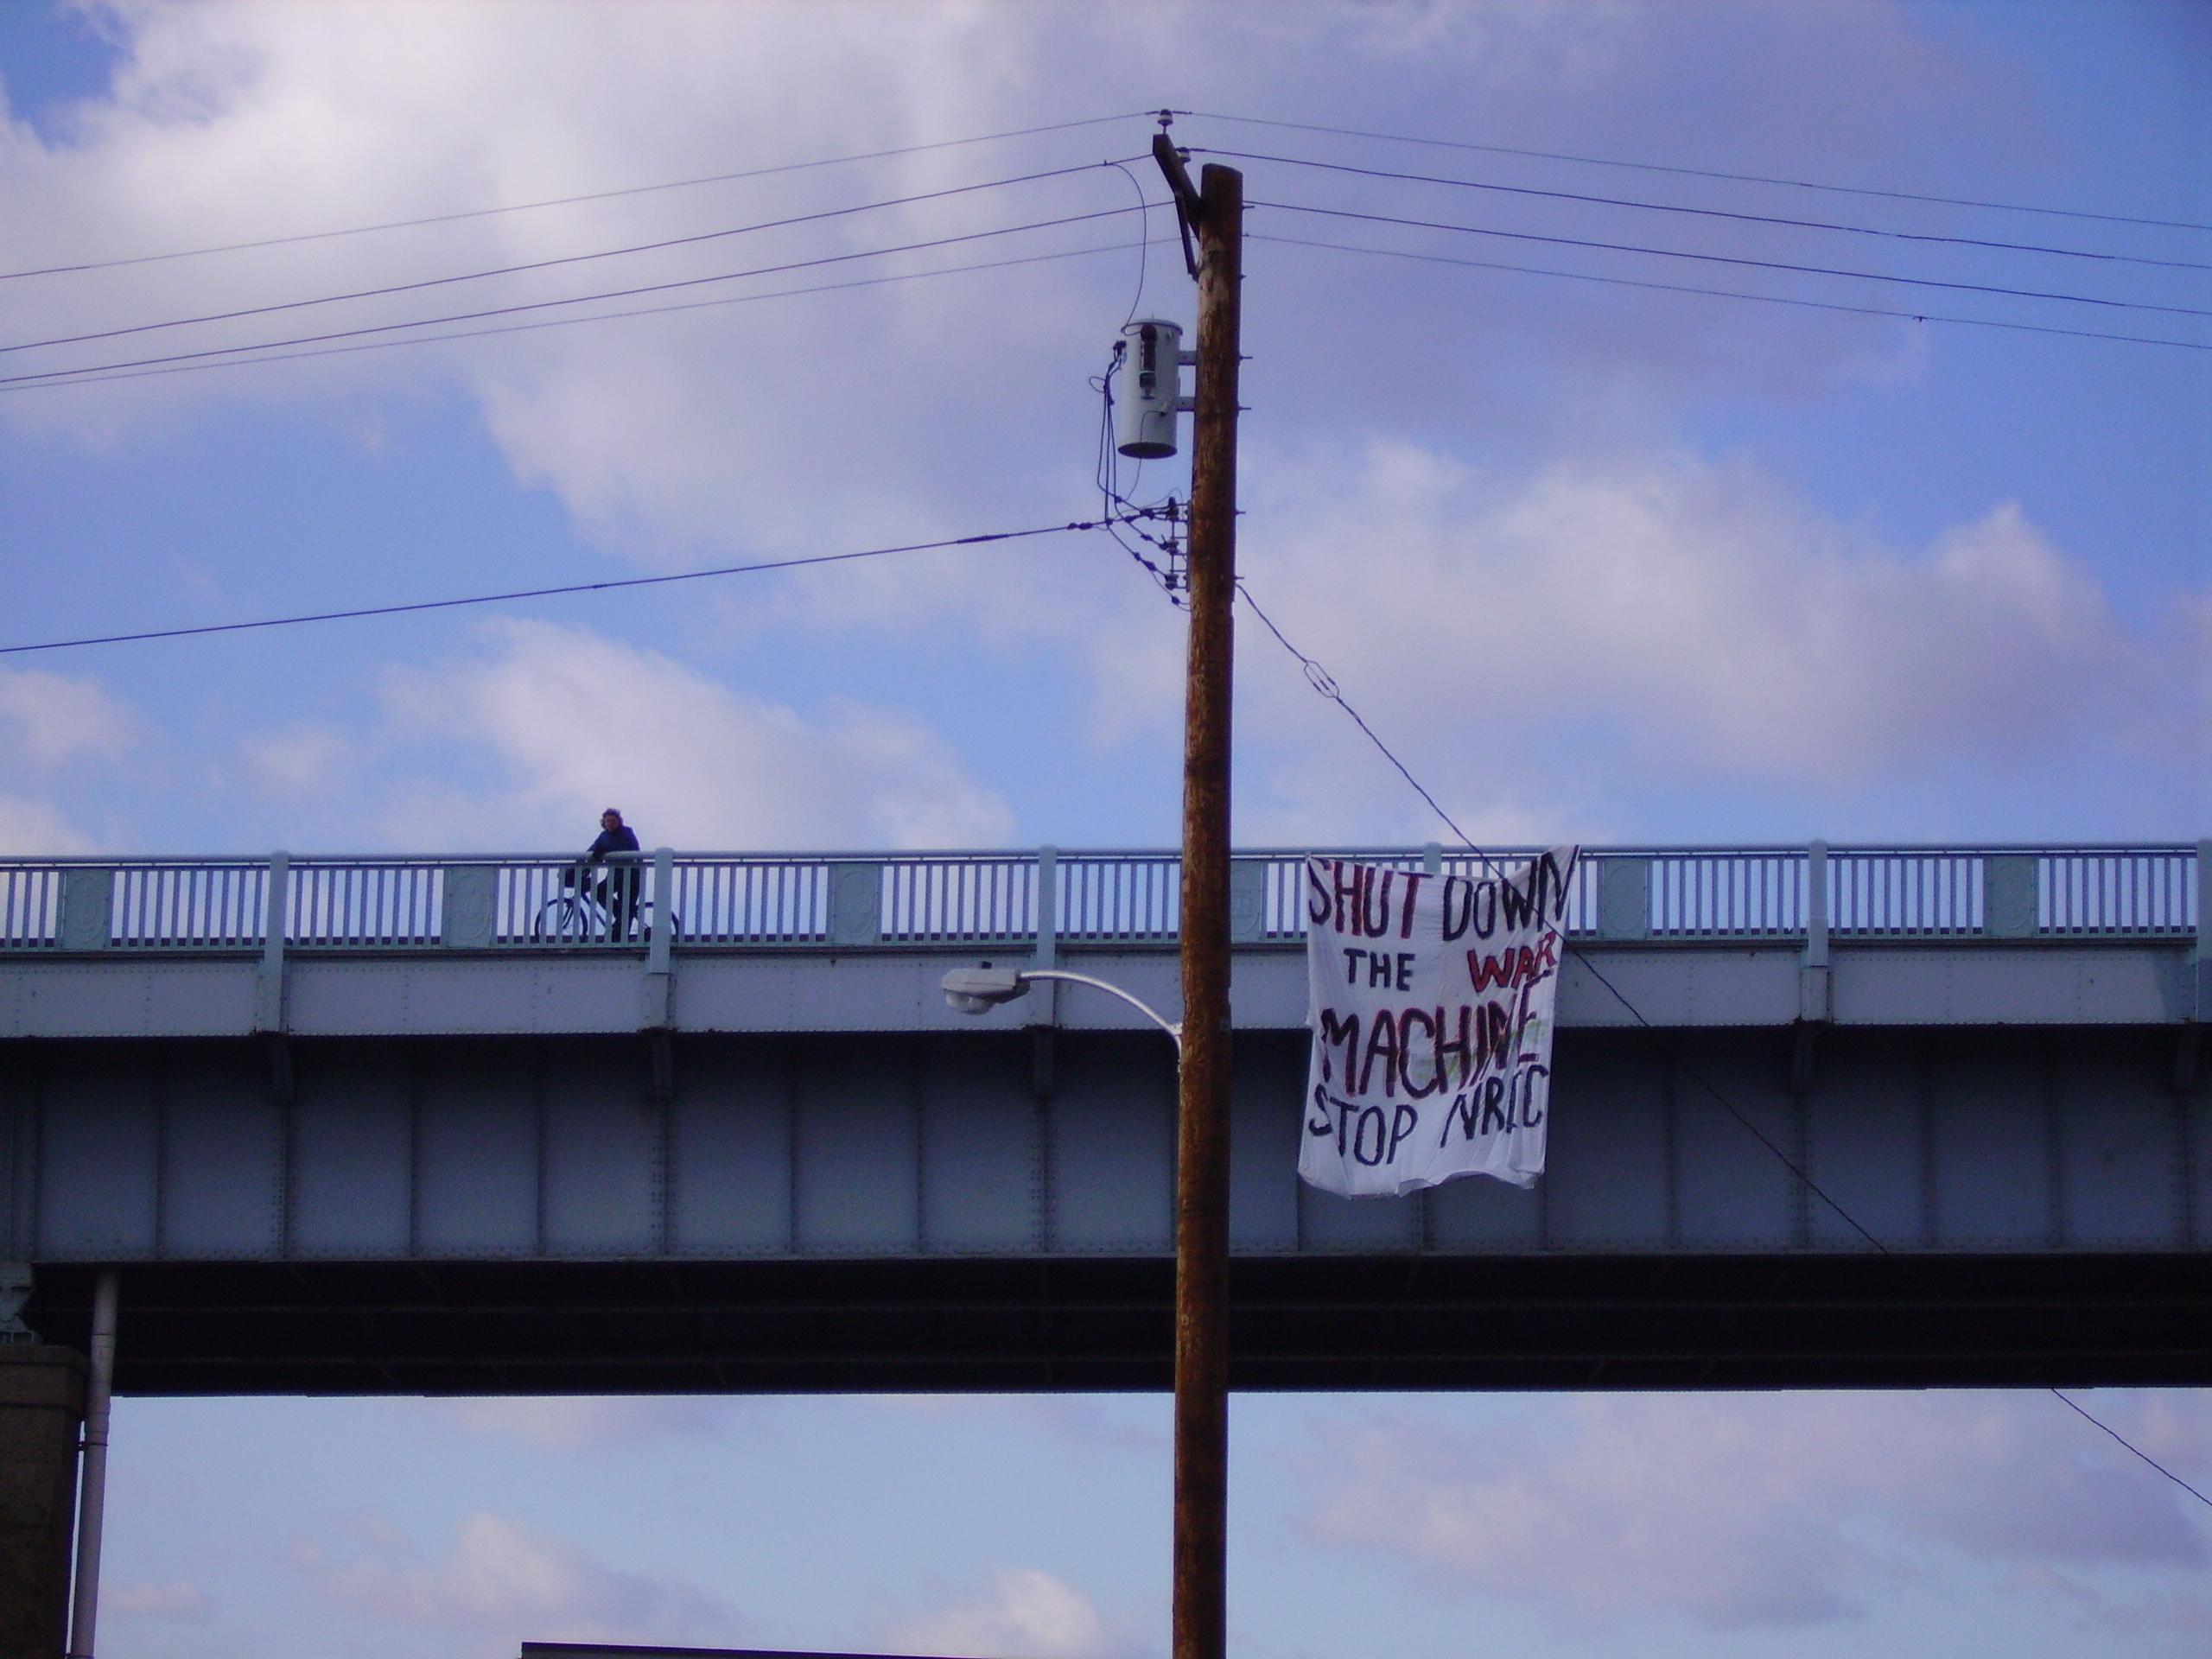 Imgp 40th St Bridge Pittsburgh